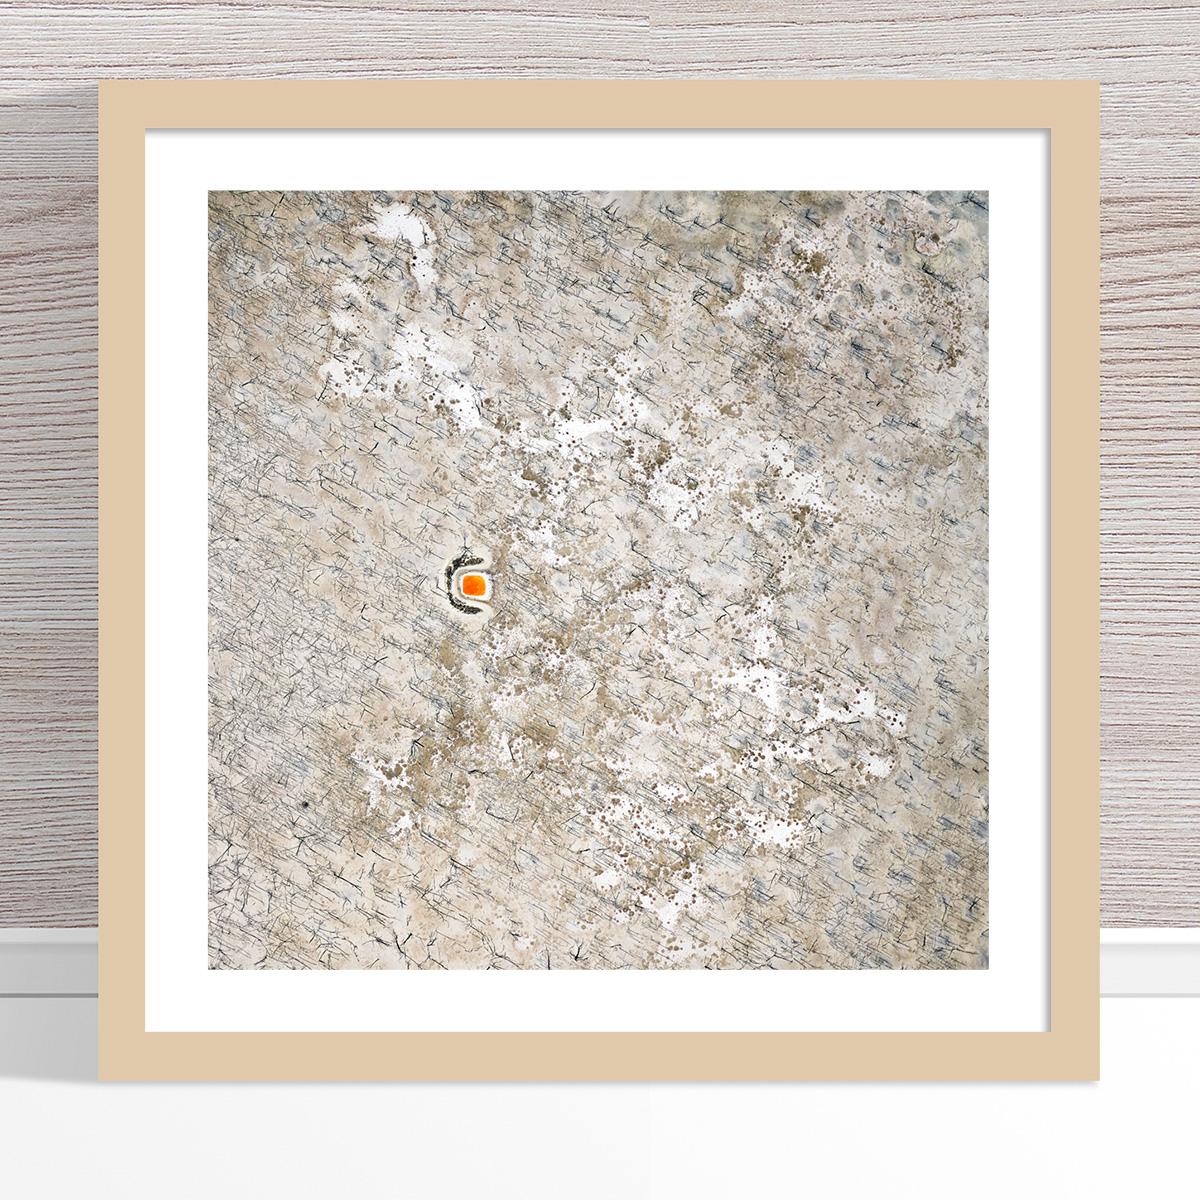 Chris Saunders - 'Aerial Outback 008' Light Frame